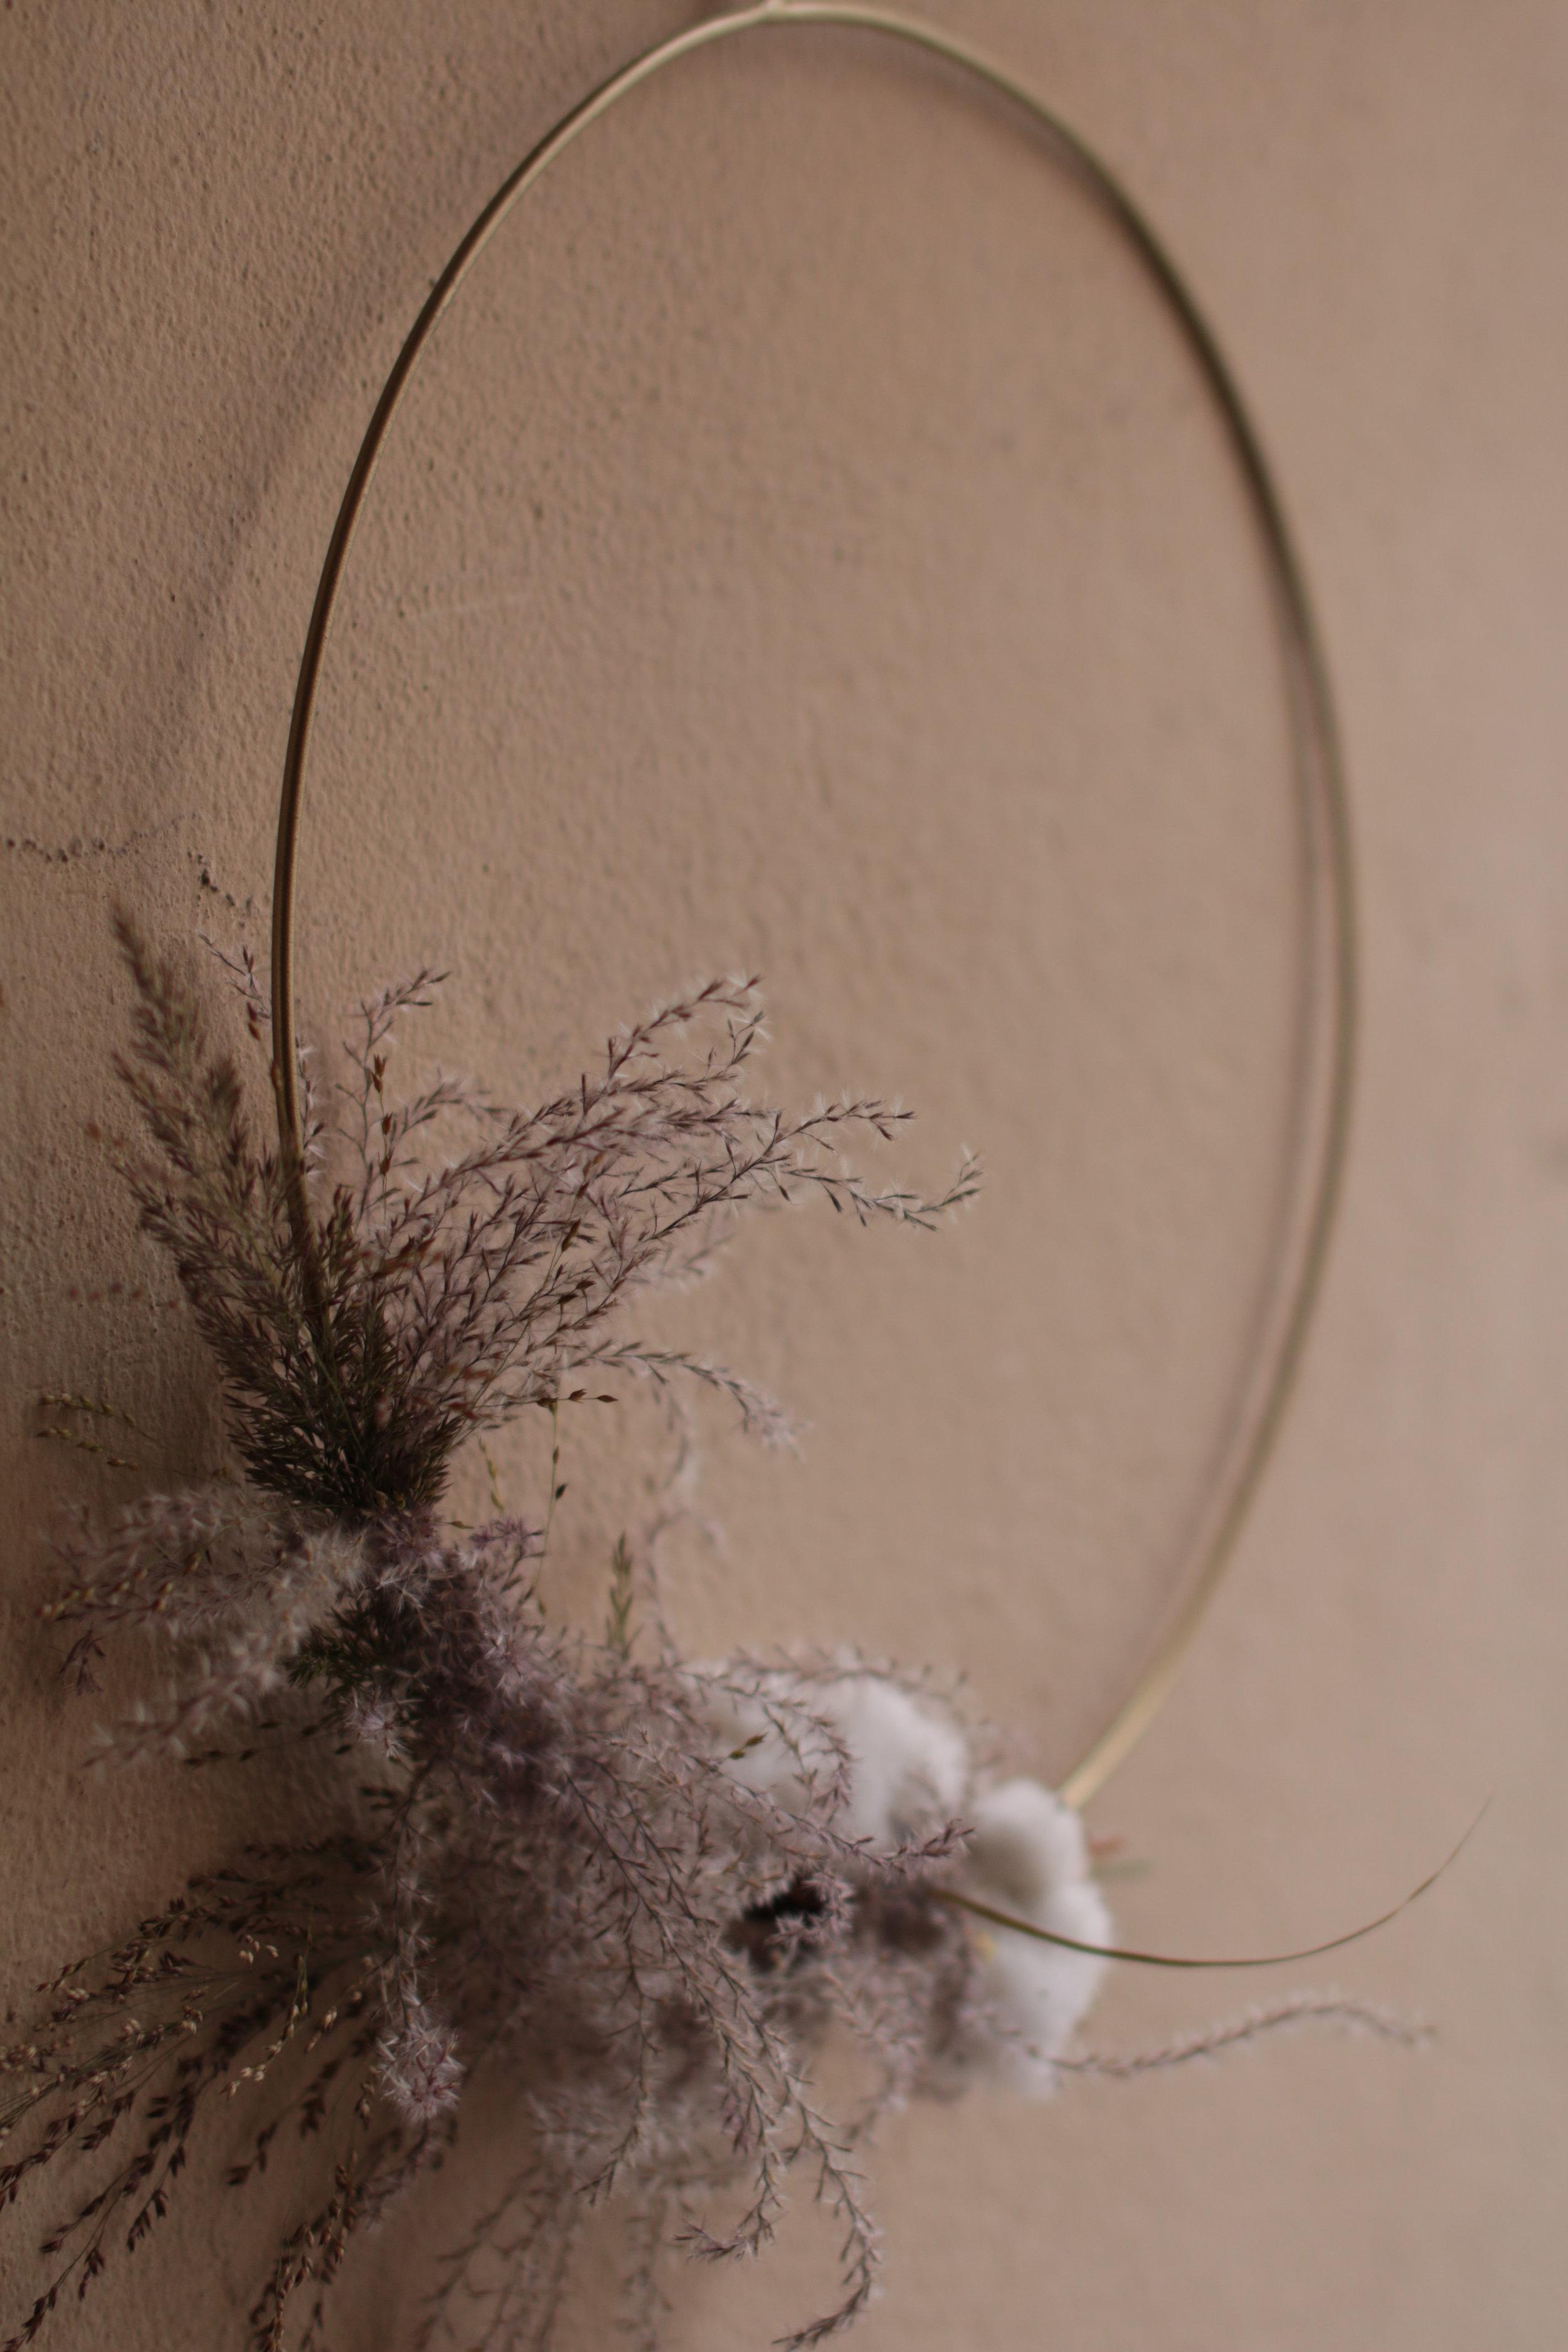 Pampa heinä/pampas grassa, cotton, dried flower, modern wreath